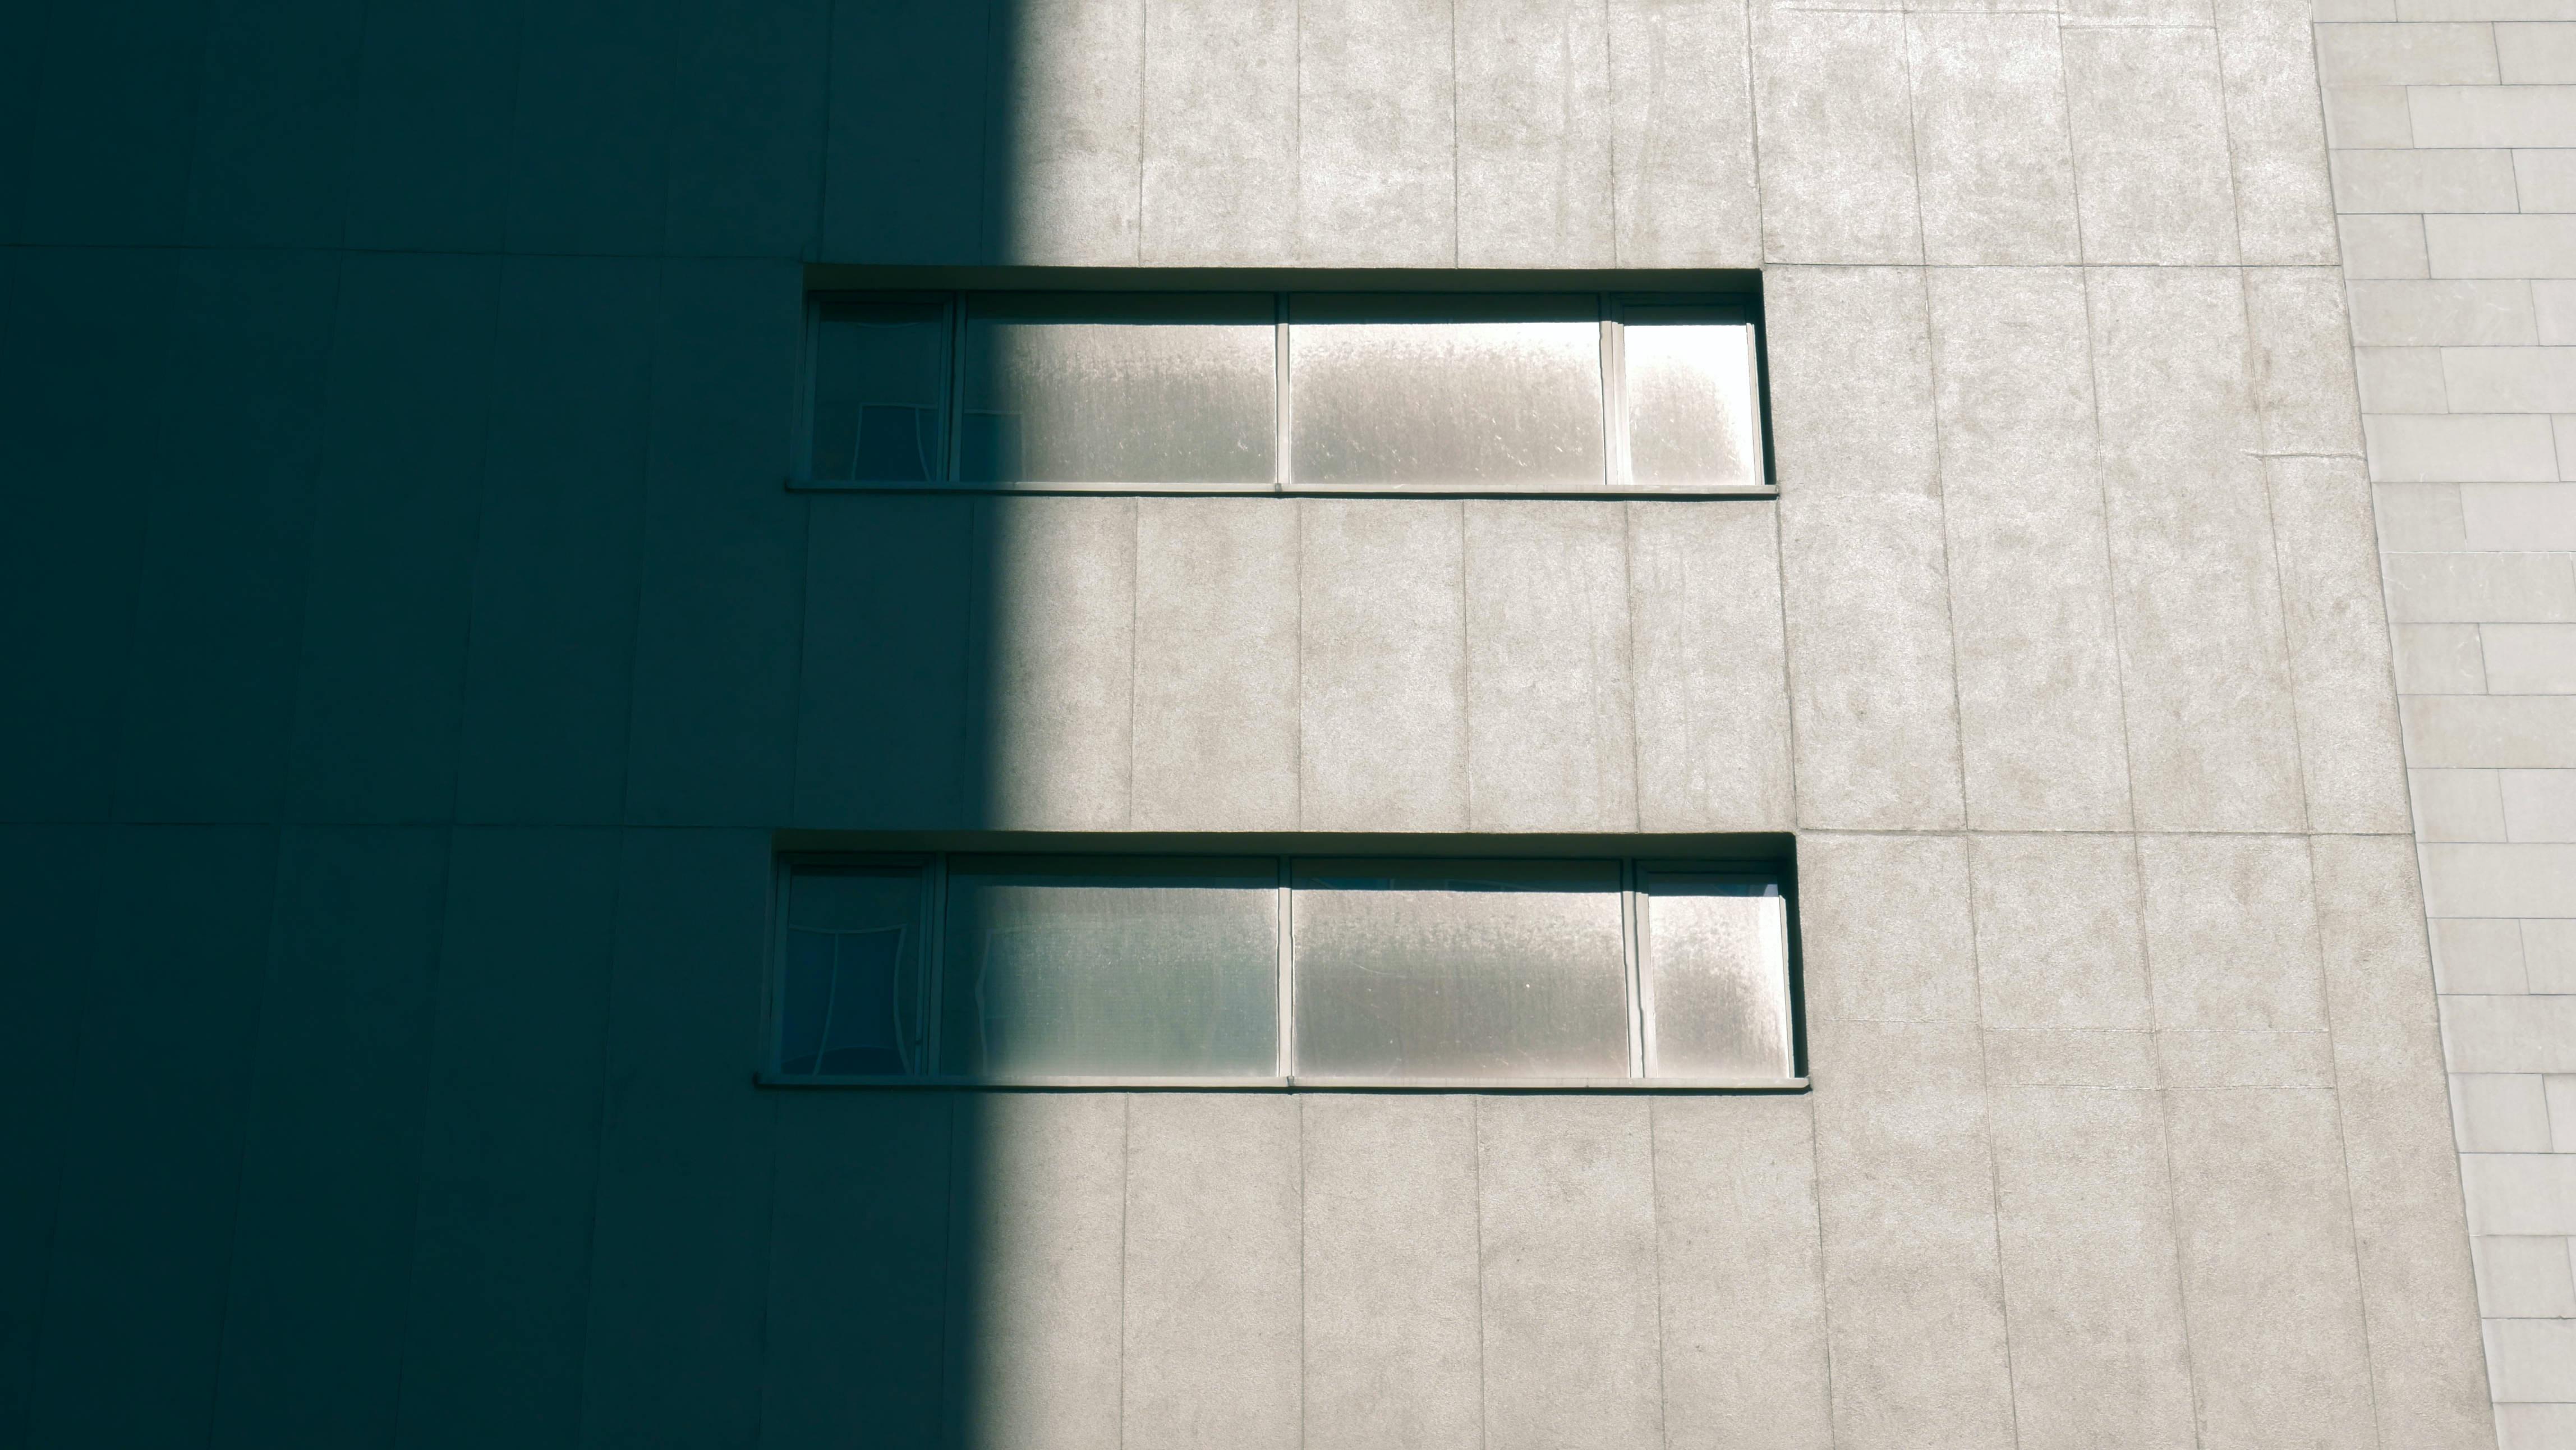 Concrete building with horizontal windows half in shadow